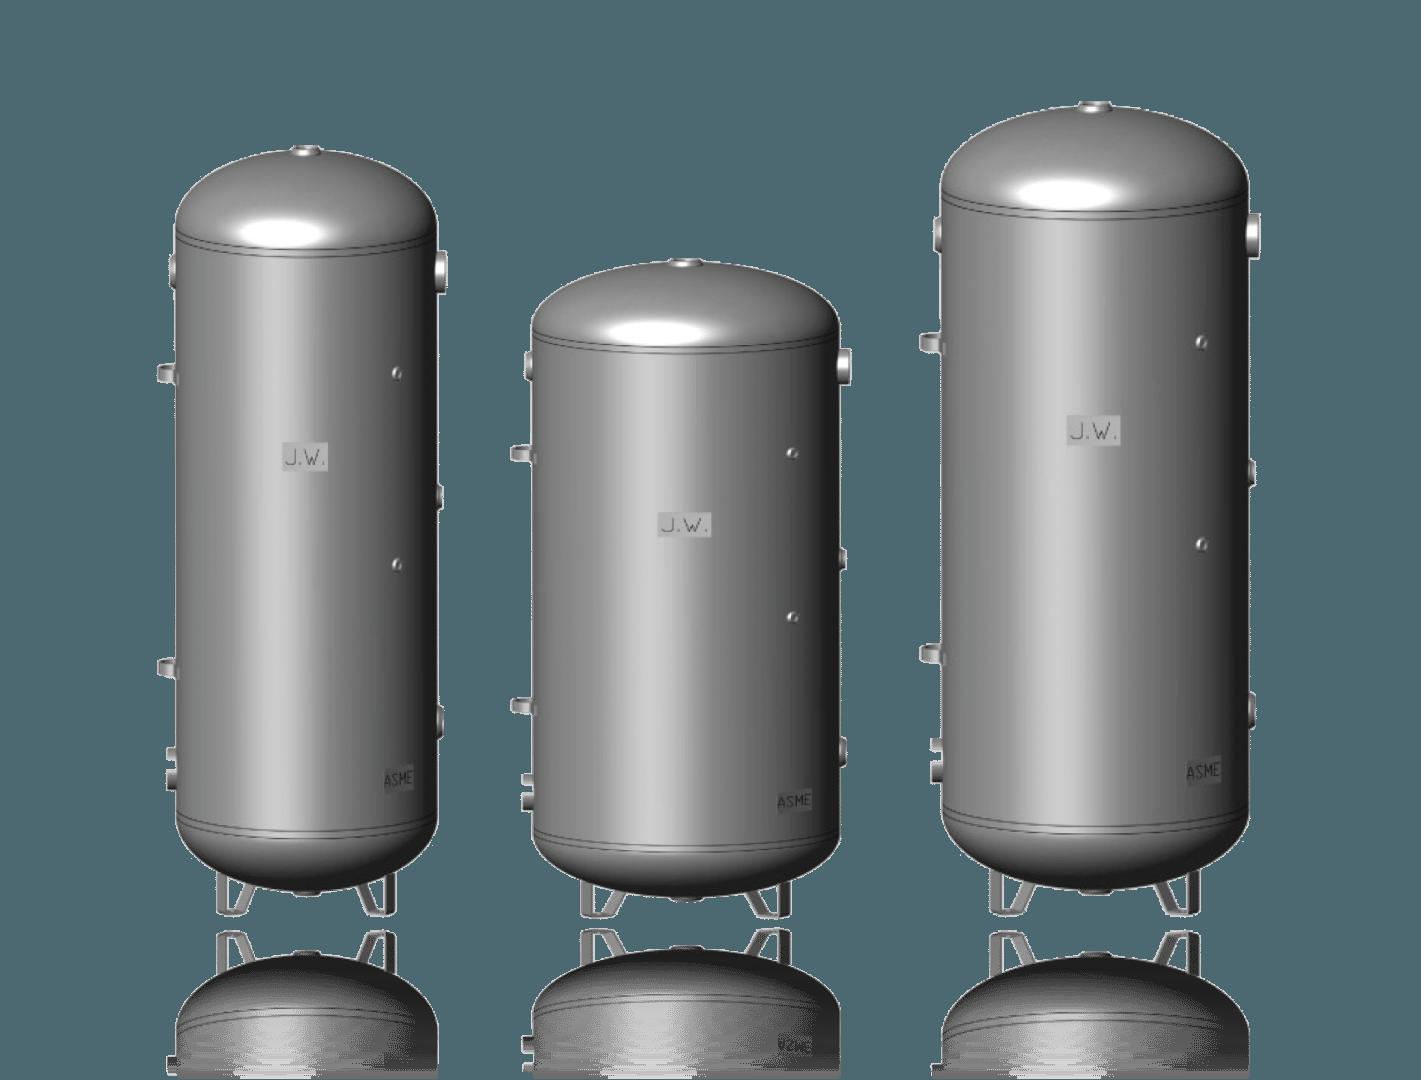 Tarm Biomass Thermal Storage